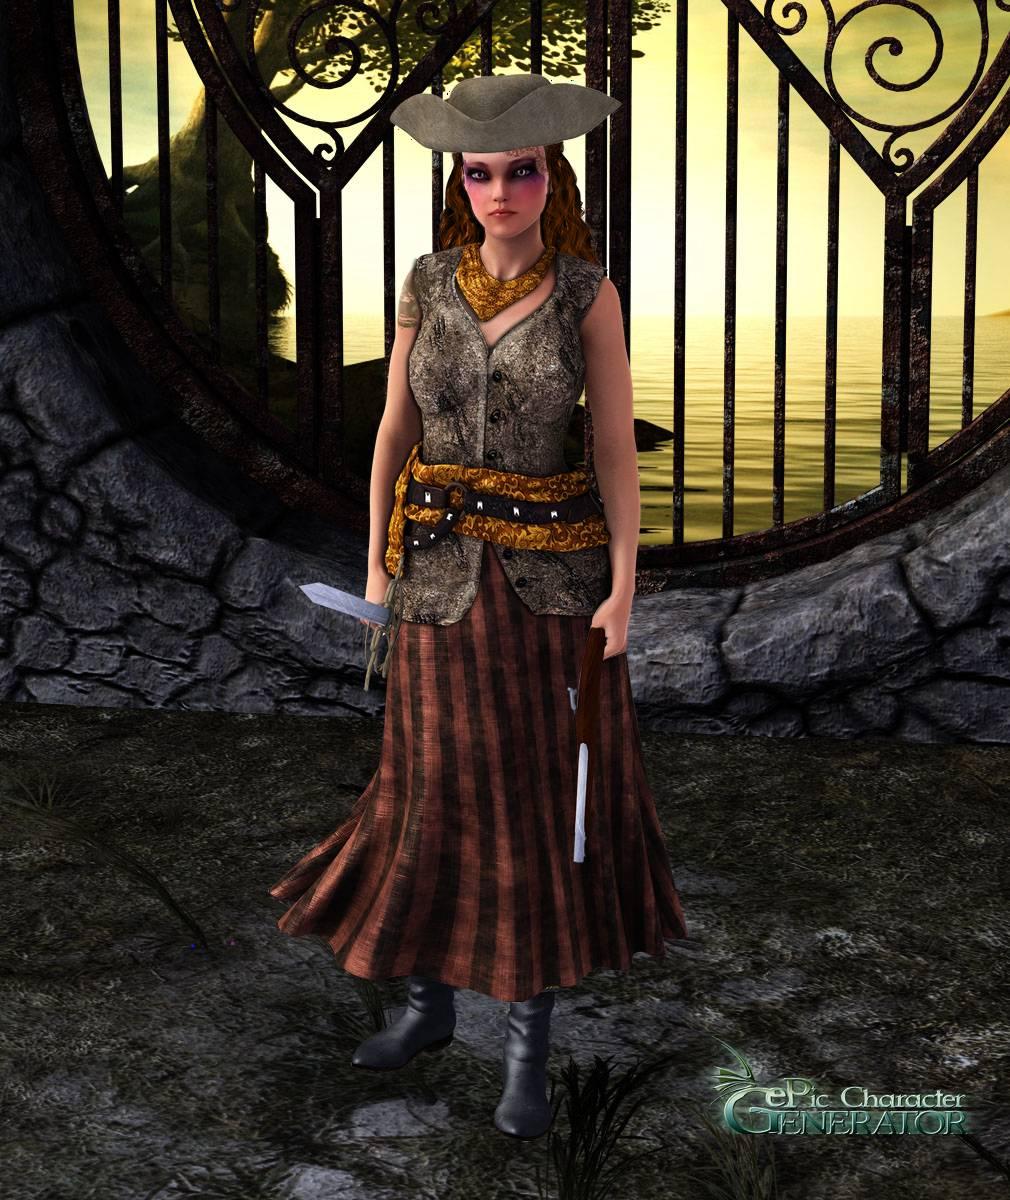 ePic Character Generator Season 2 Female Pirate Screenshot 01